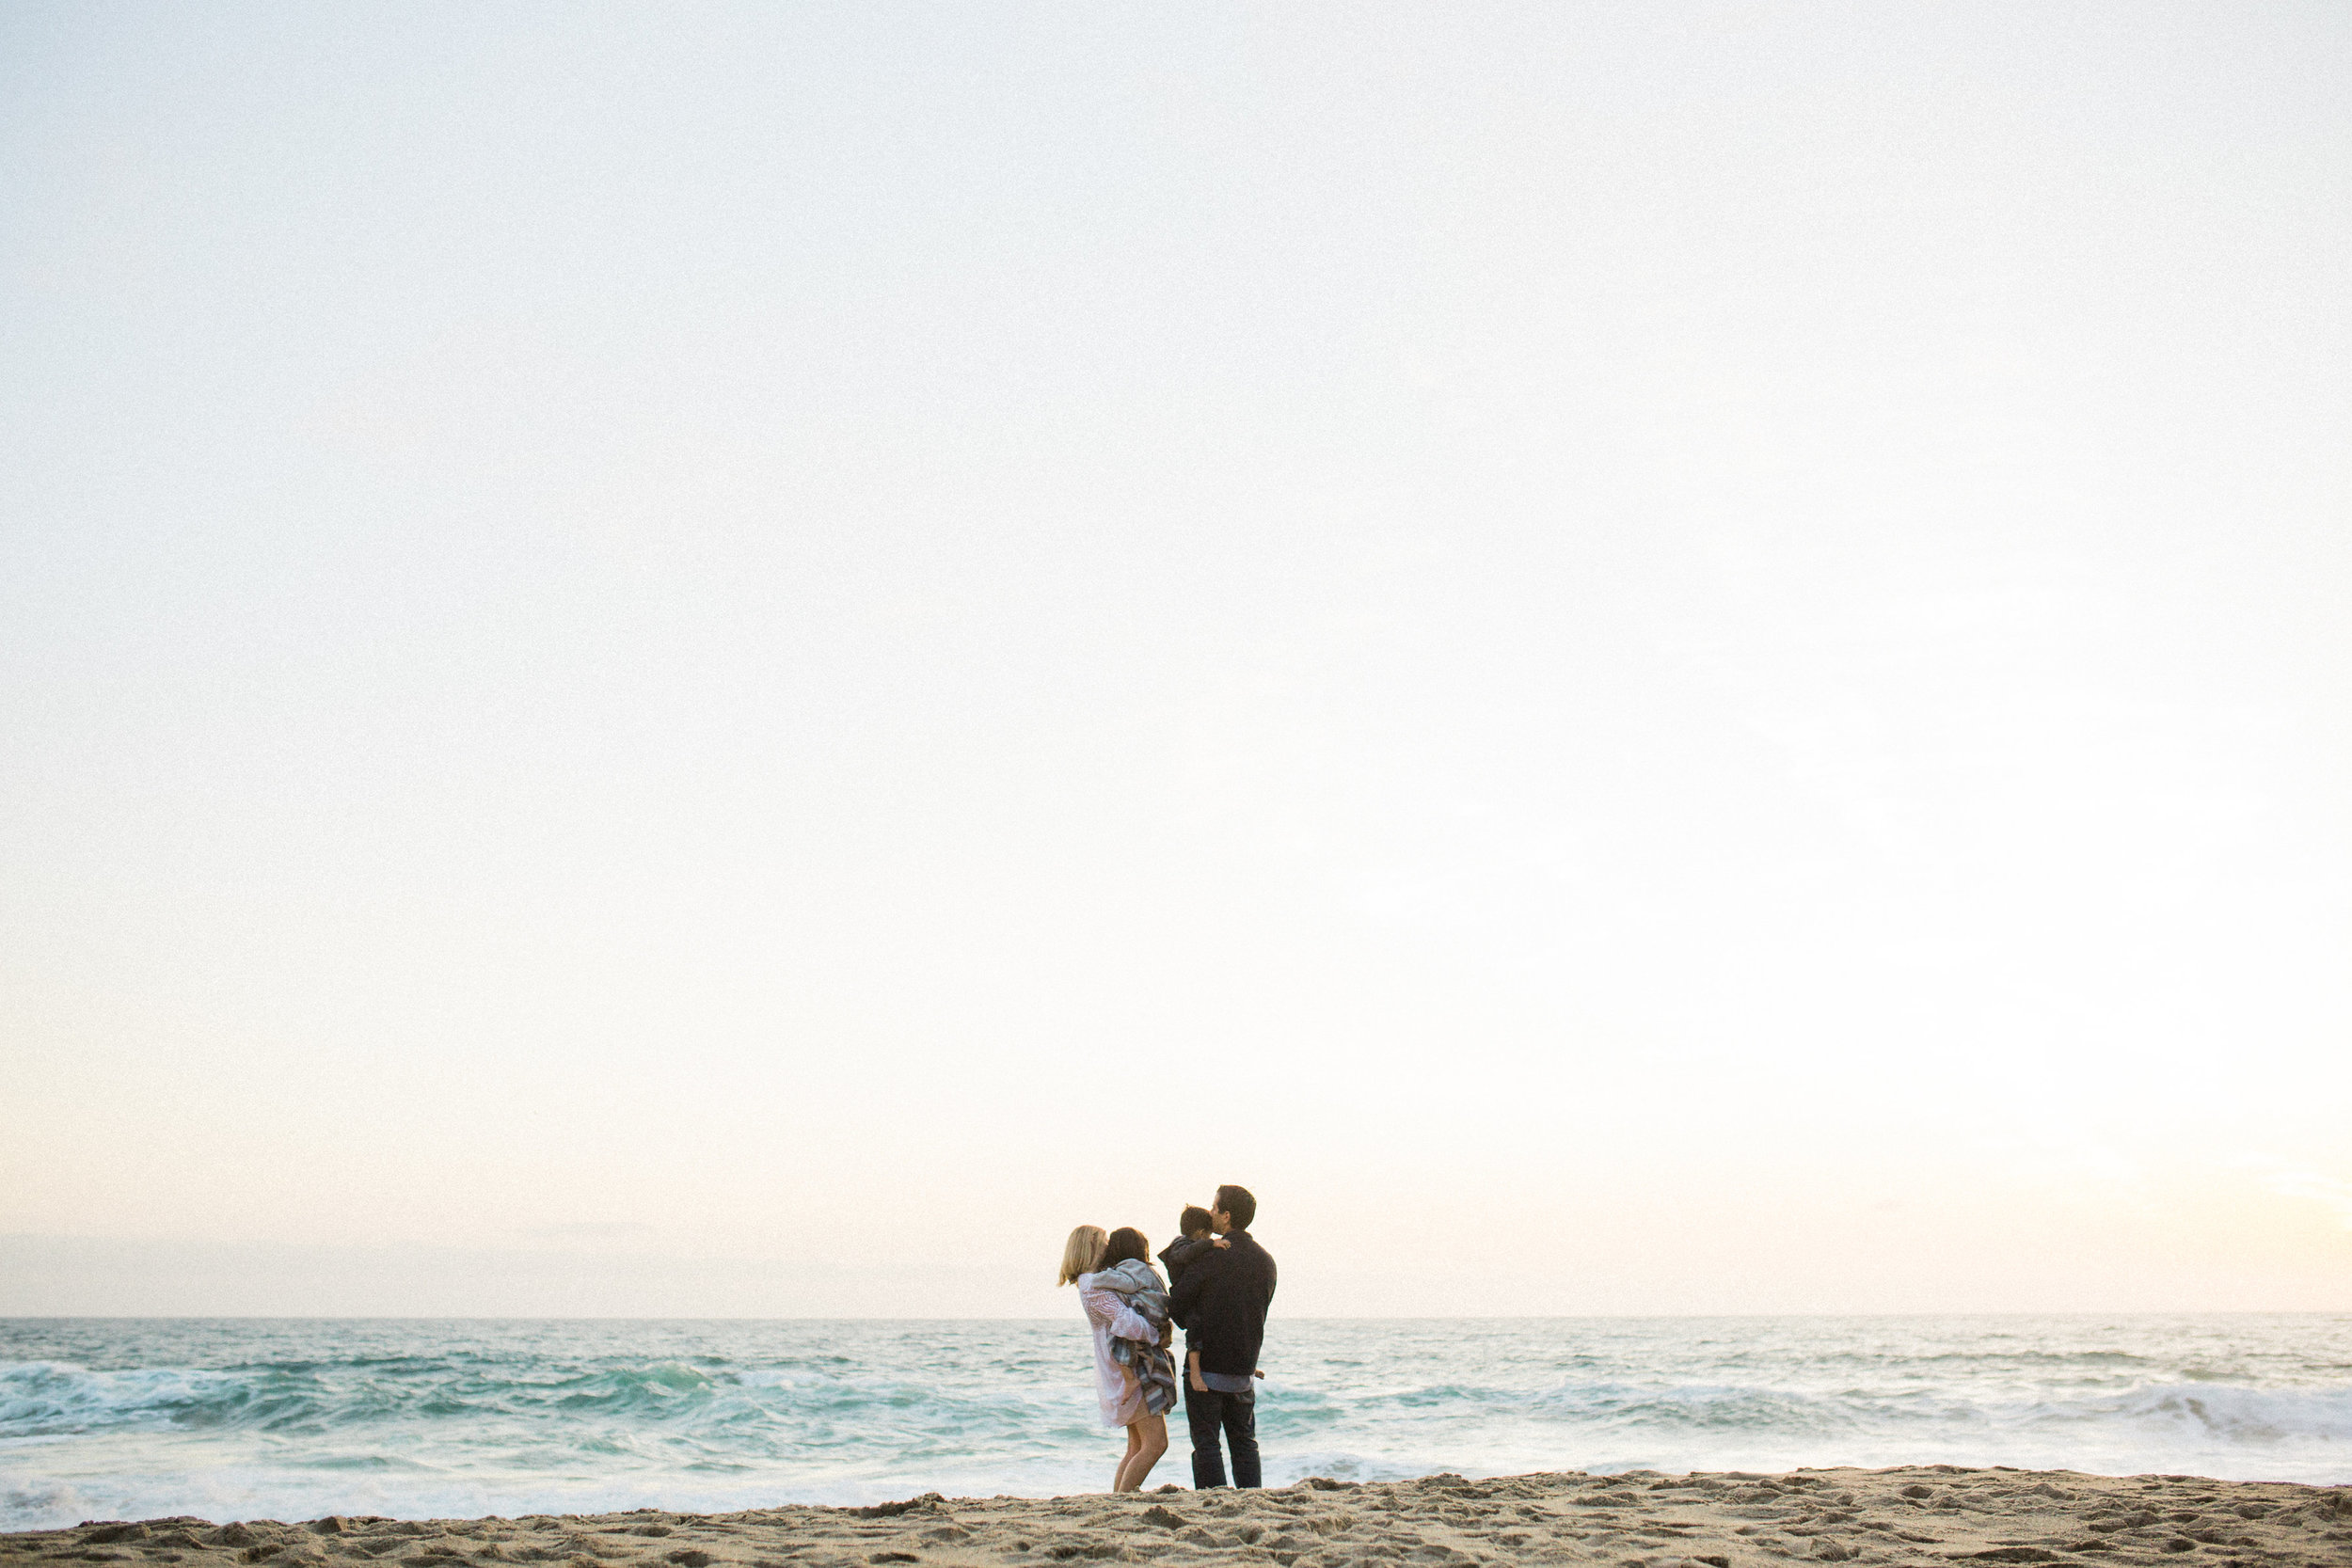 ruiz-family_laguna_los-angeles-beach-family-photography-196.jpg